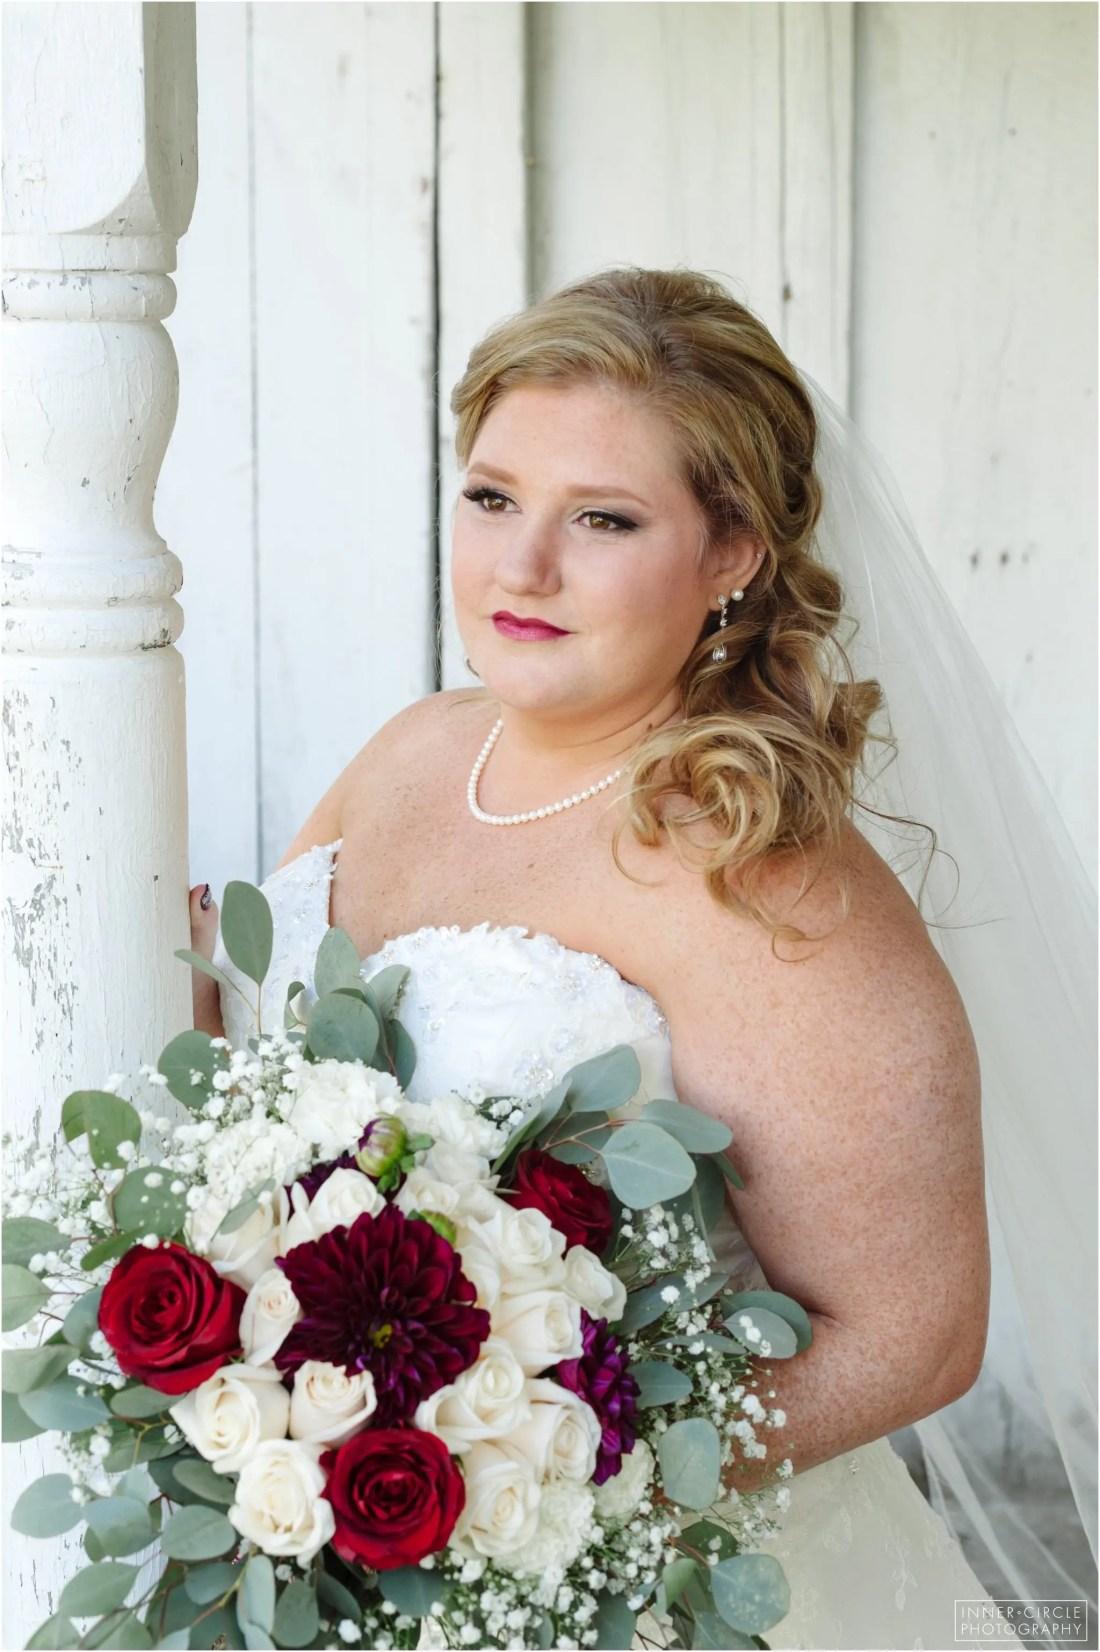 chrislauren_WED_InnerCirclePhoto_183 Chris + Lauren :: MARRIED!